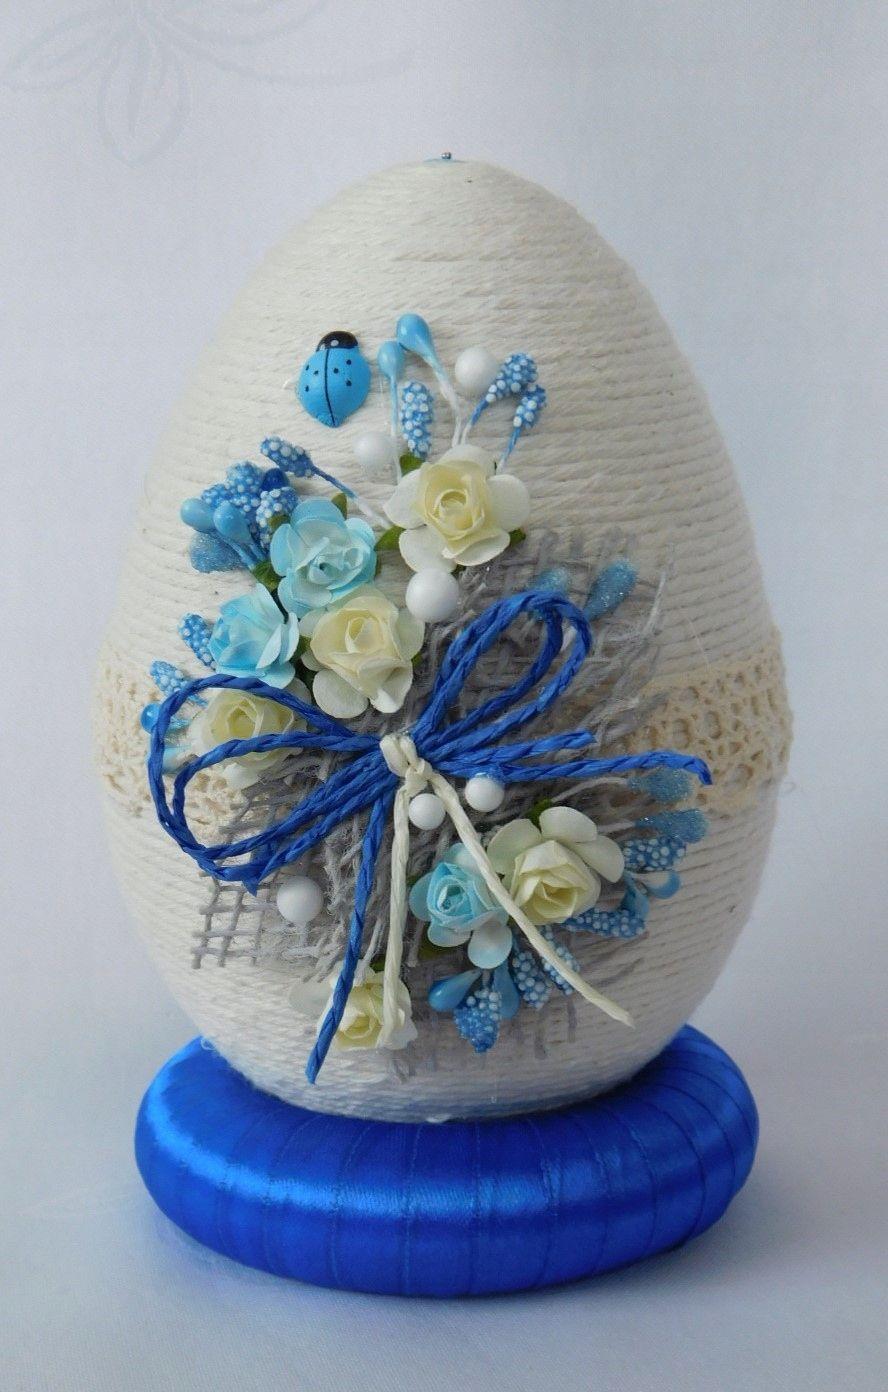 Piekne Jajko Pisanka Ozdoby Wielkanocne Rekodzielo 7165947305 Oficjalne Archiwum Allegro Easter Crafts Easter Egg Decorating Easter Projects